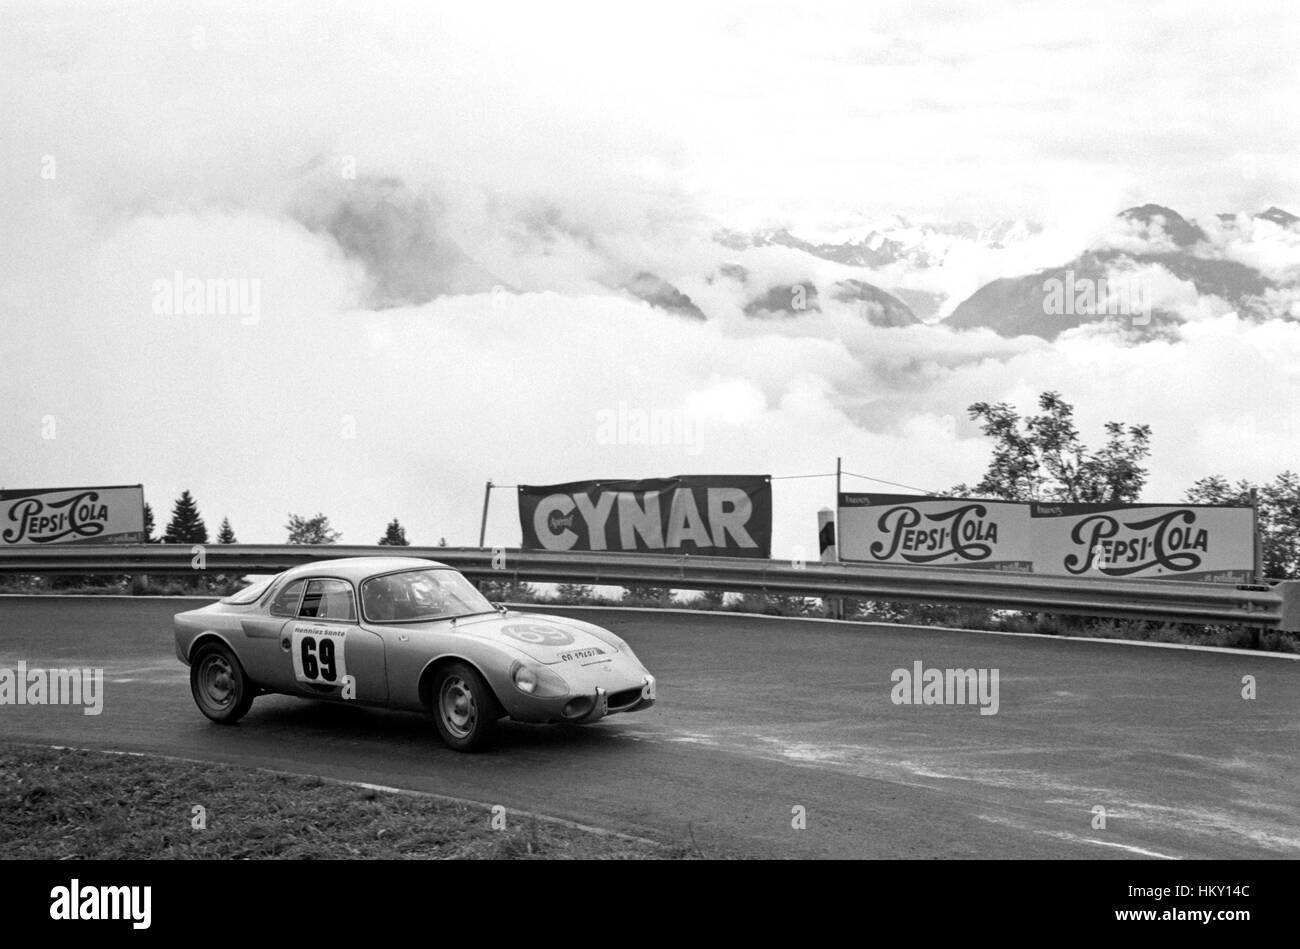 Walter Egger Swiss Rene Bonnet Djet Ollon-Villars Hillclimb 46th FL - Stock Image